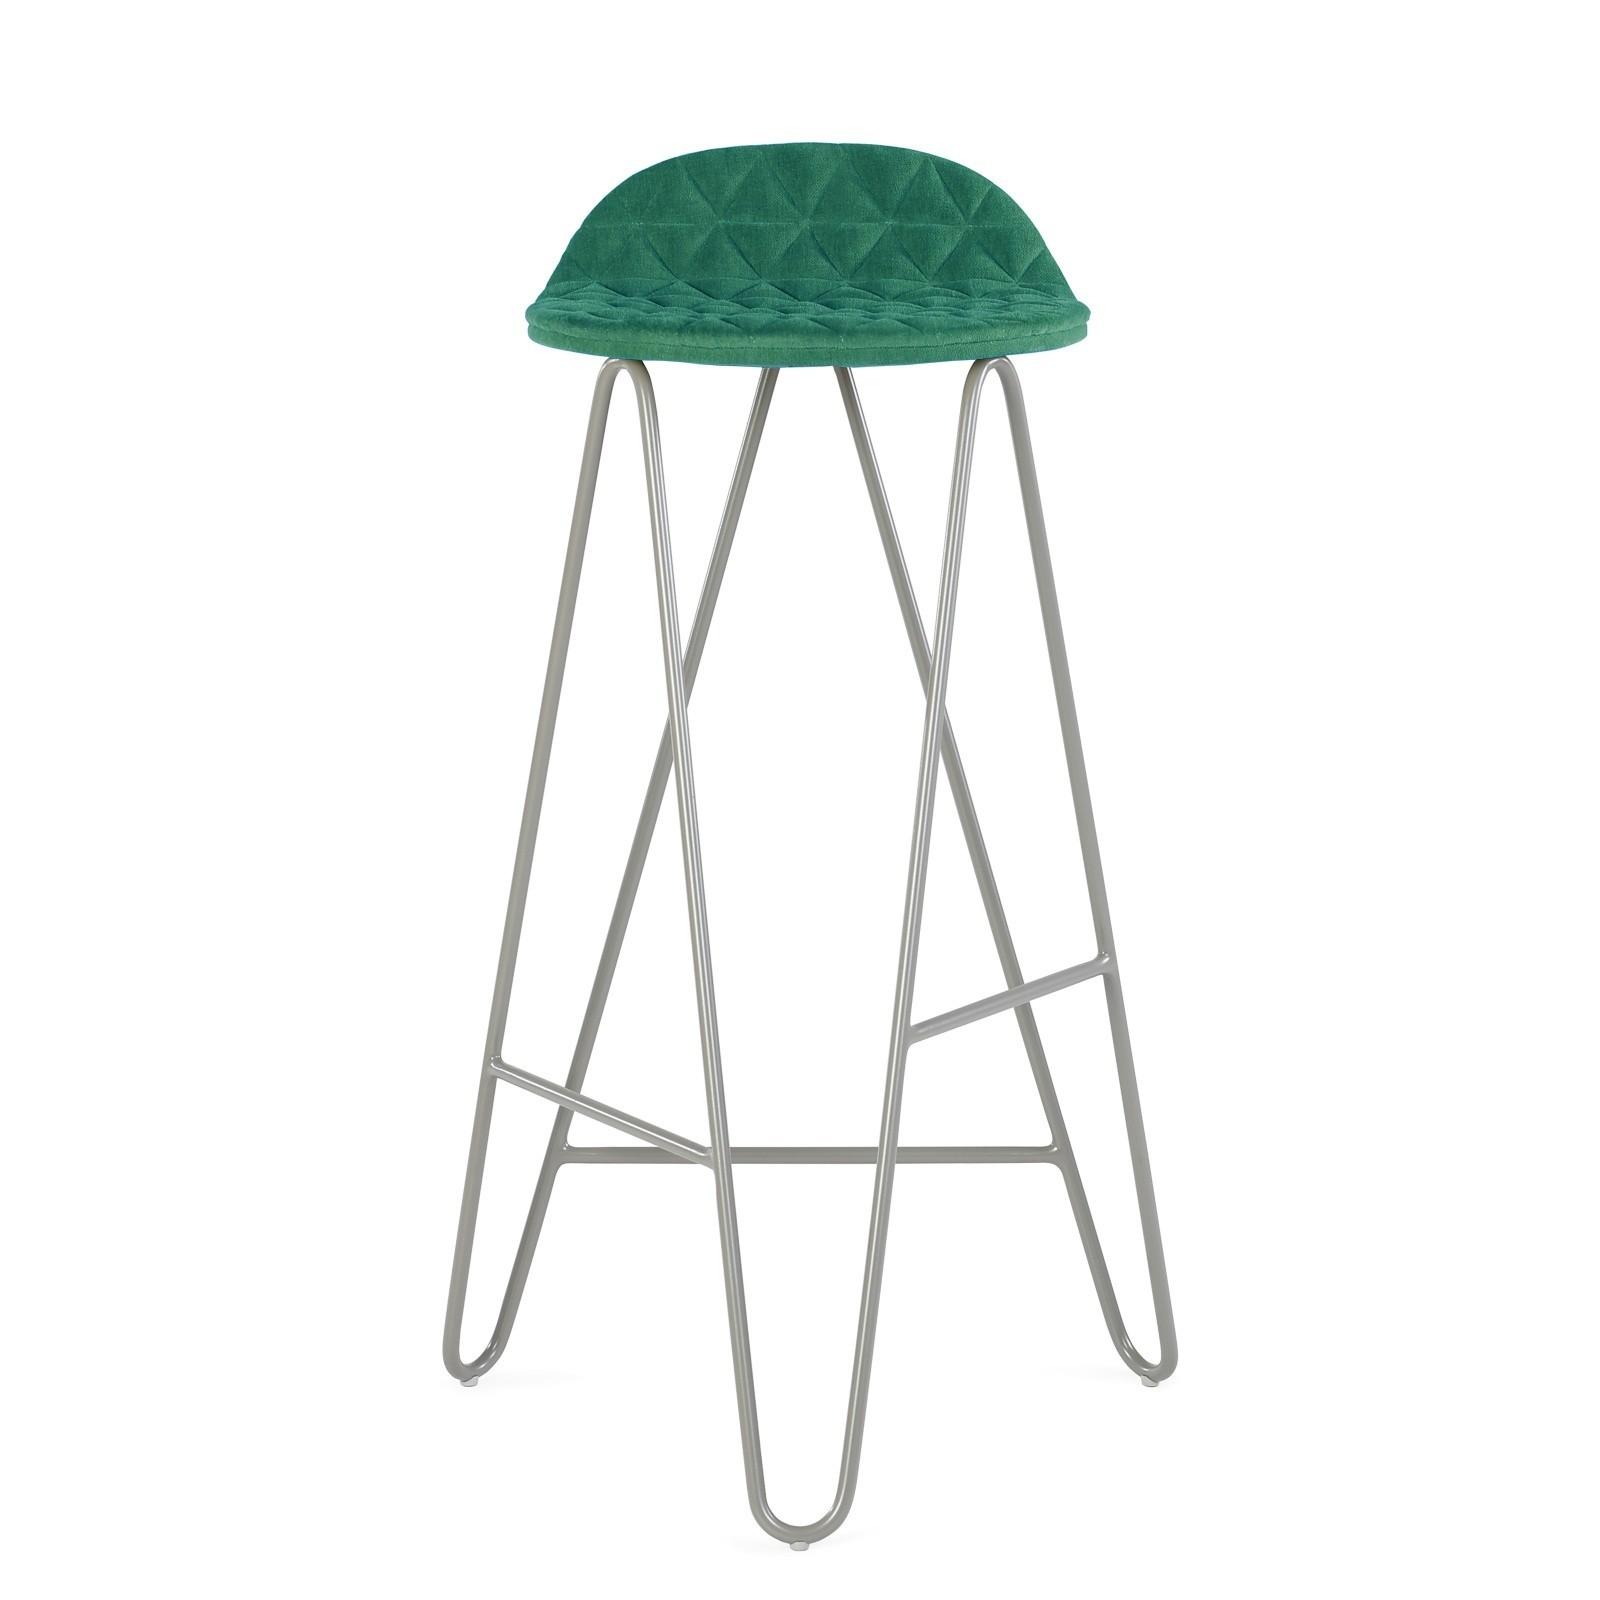 Krzesło barowe MannequinBar - 02 - turkus